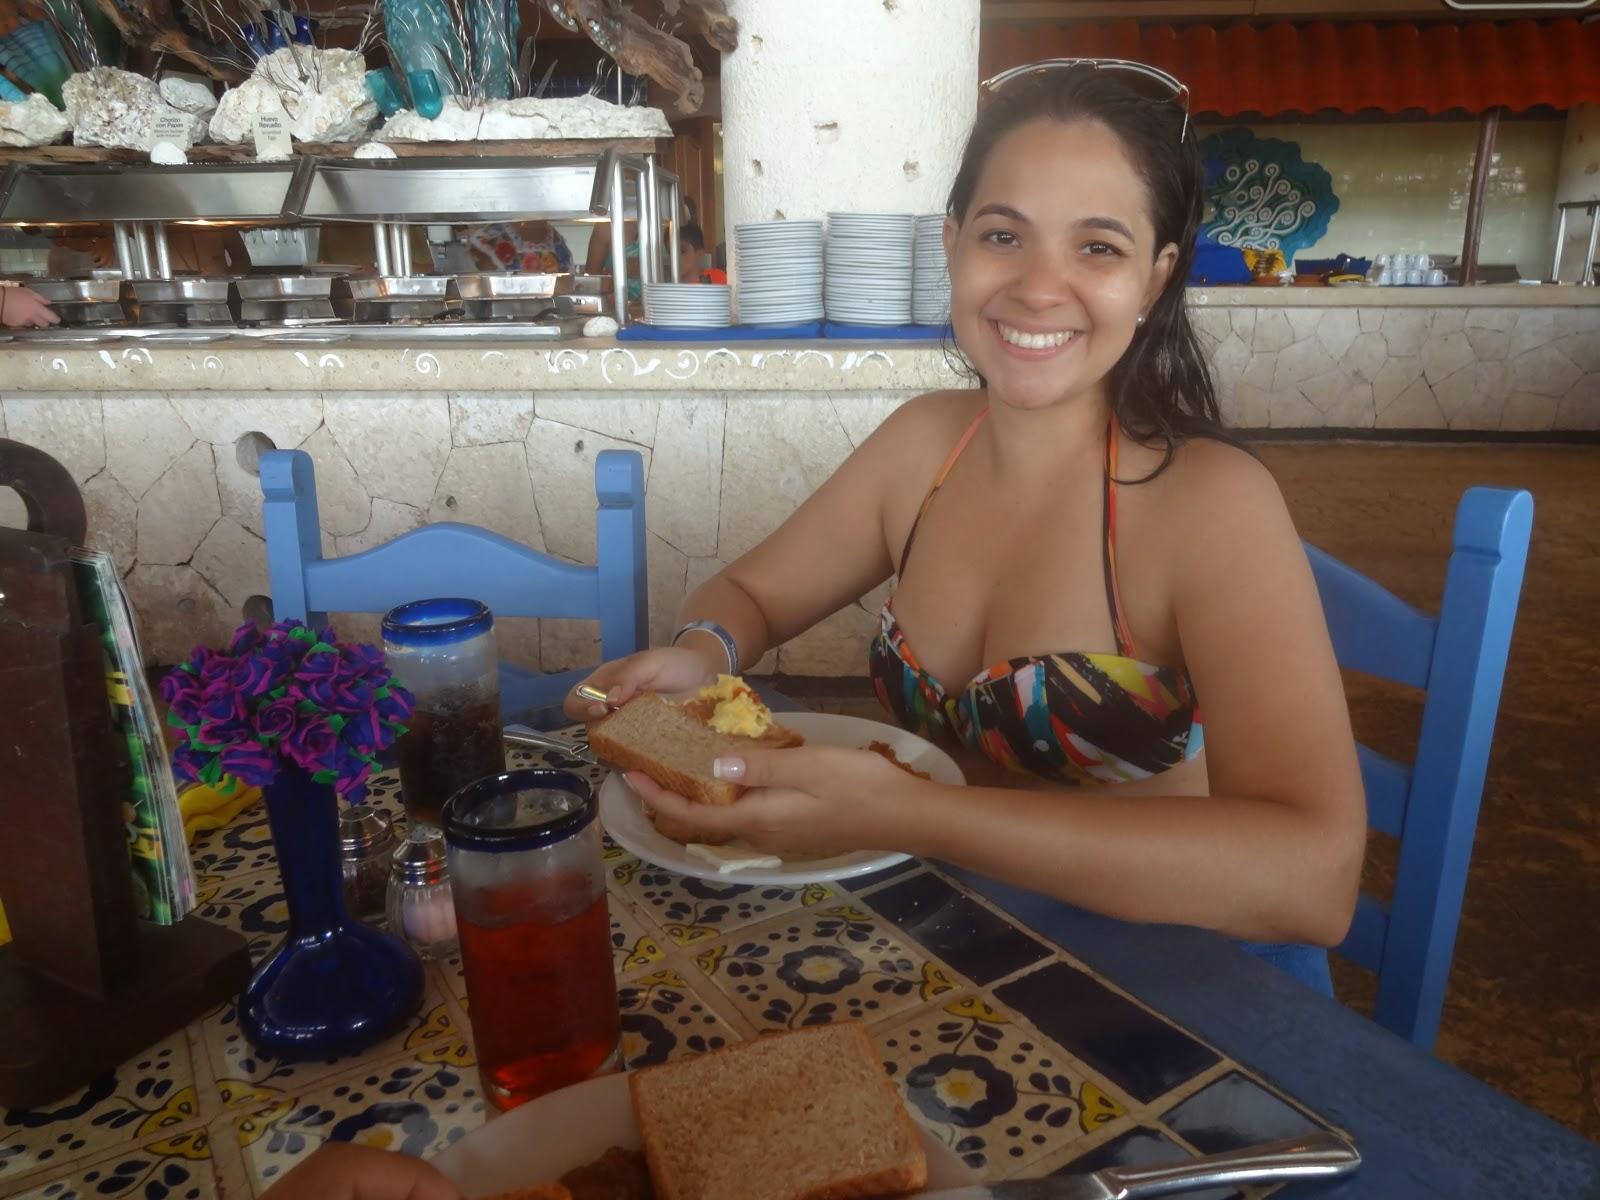 cafe da manha - parque xel-ha - cancún - riviera maya